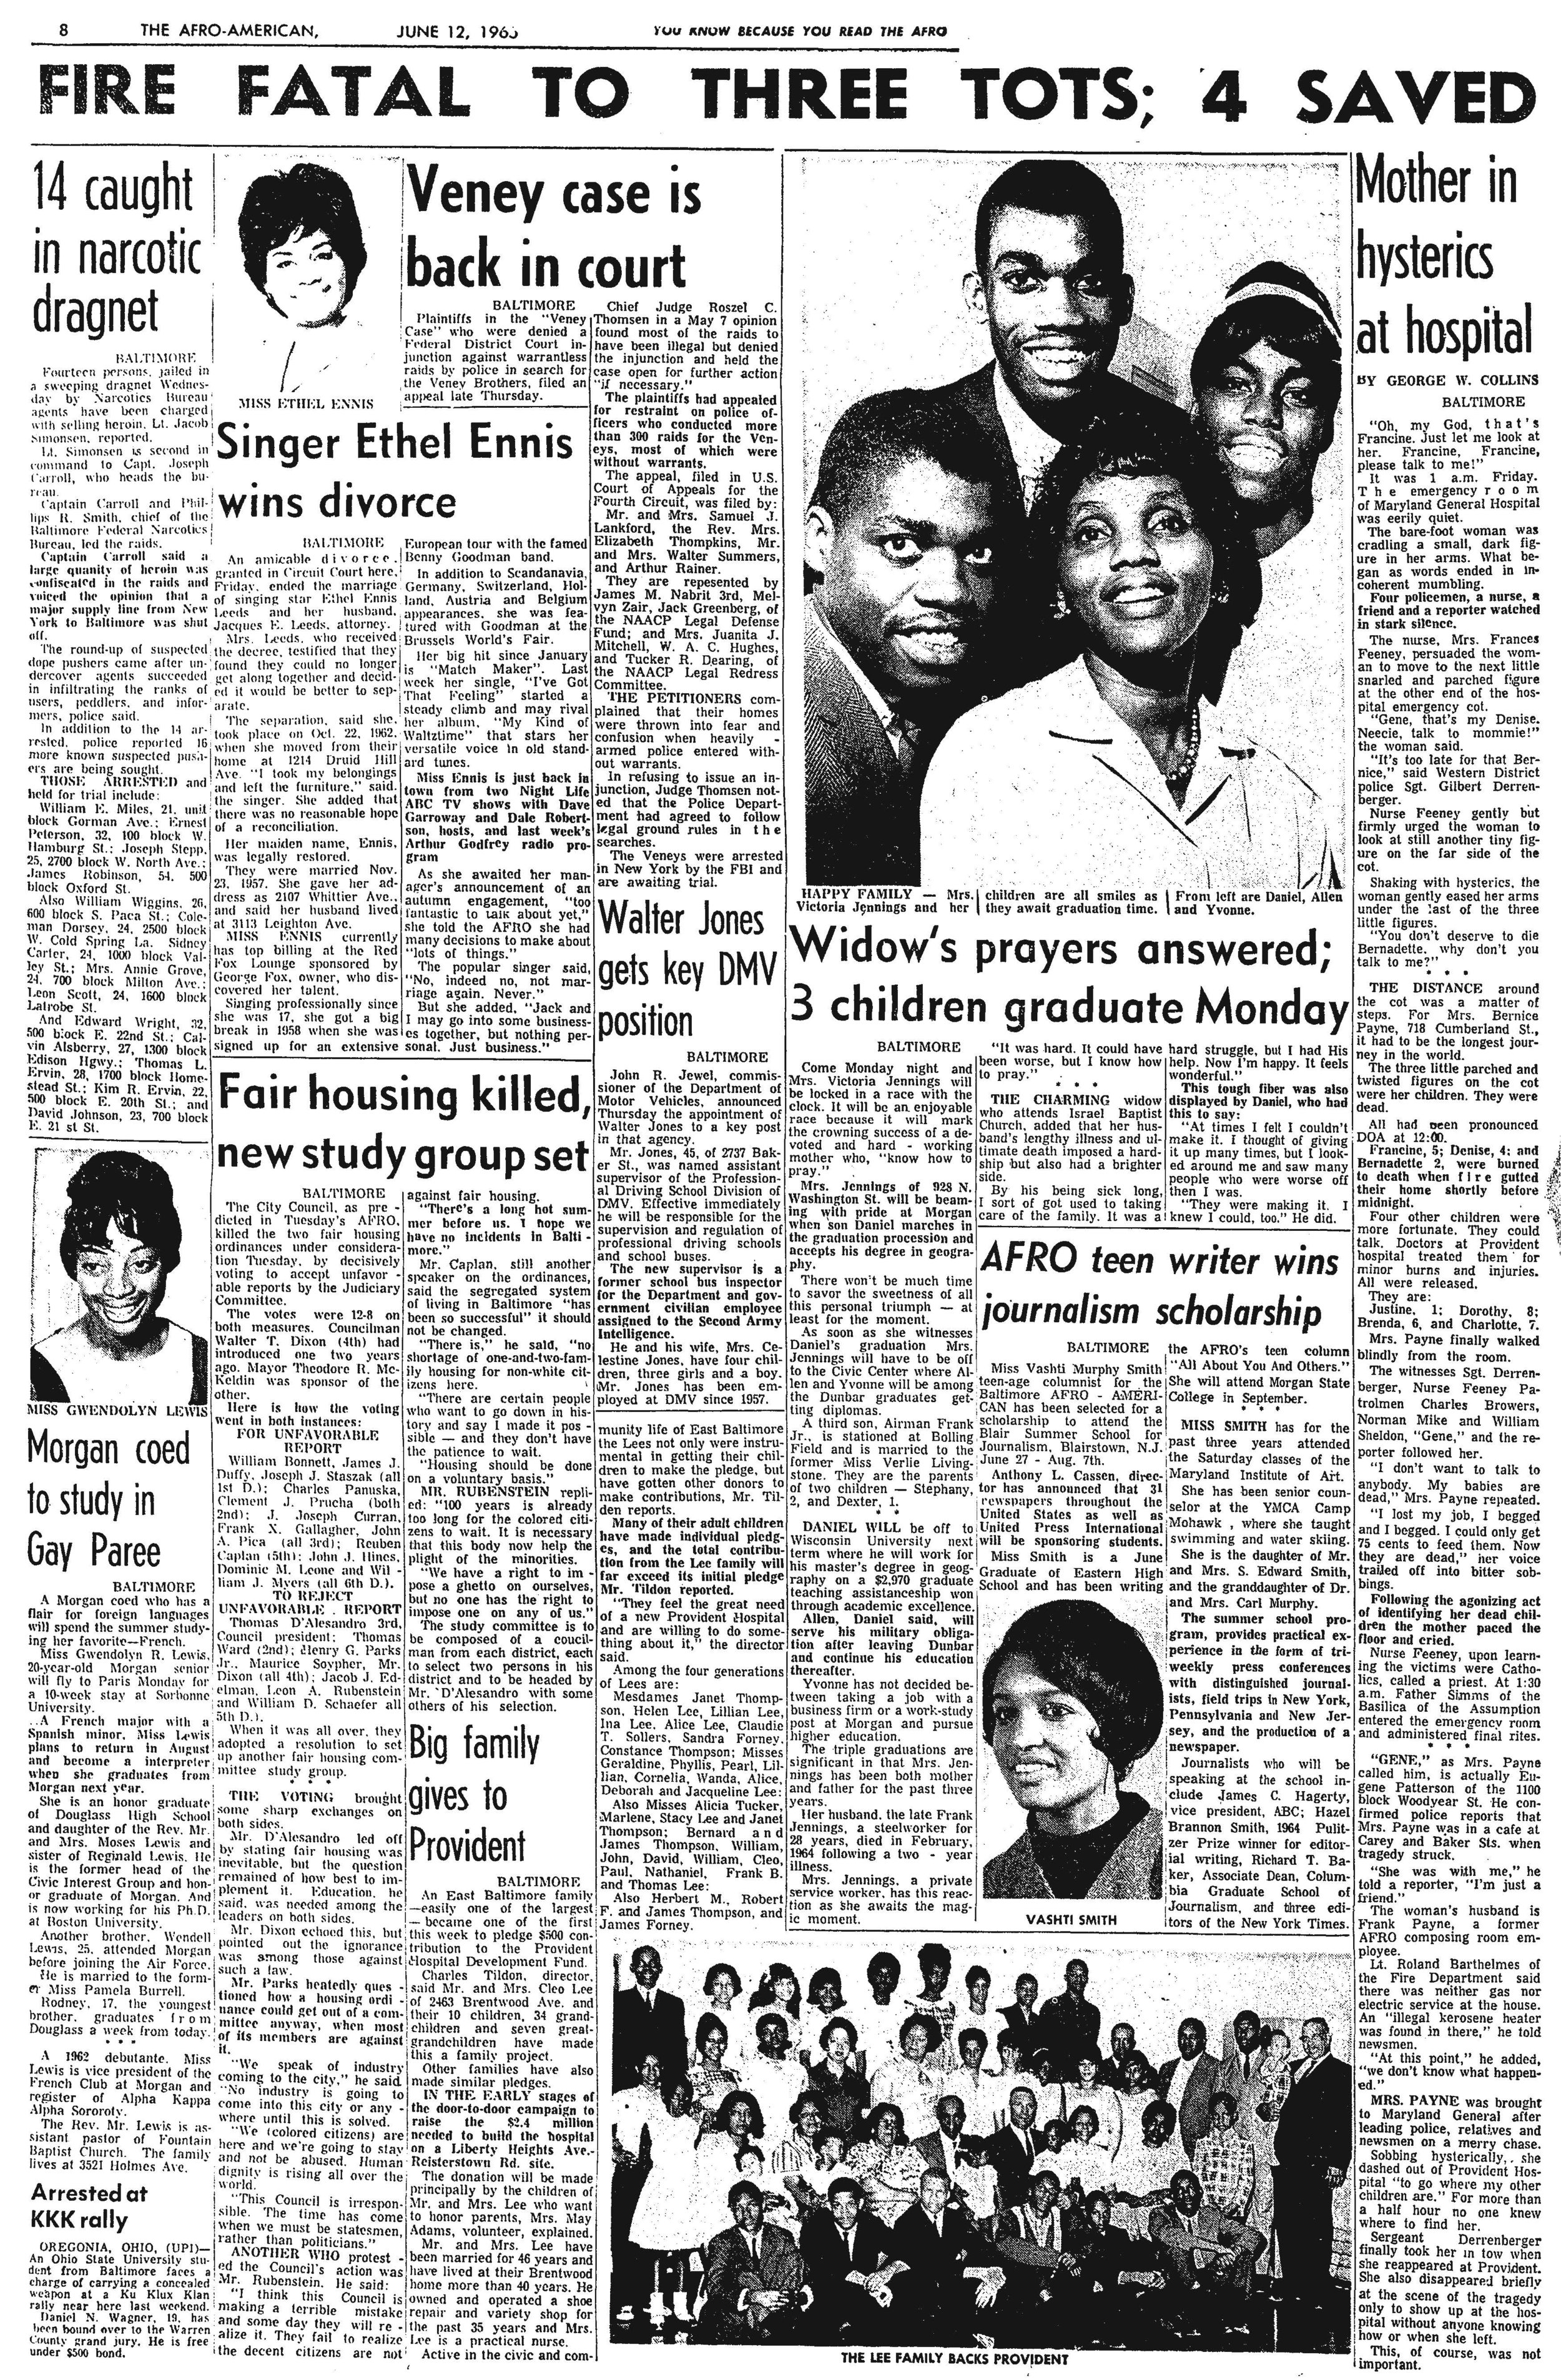 1965-6-12-AFRO_teen_writer_wins_journali.jpg